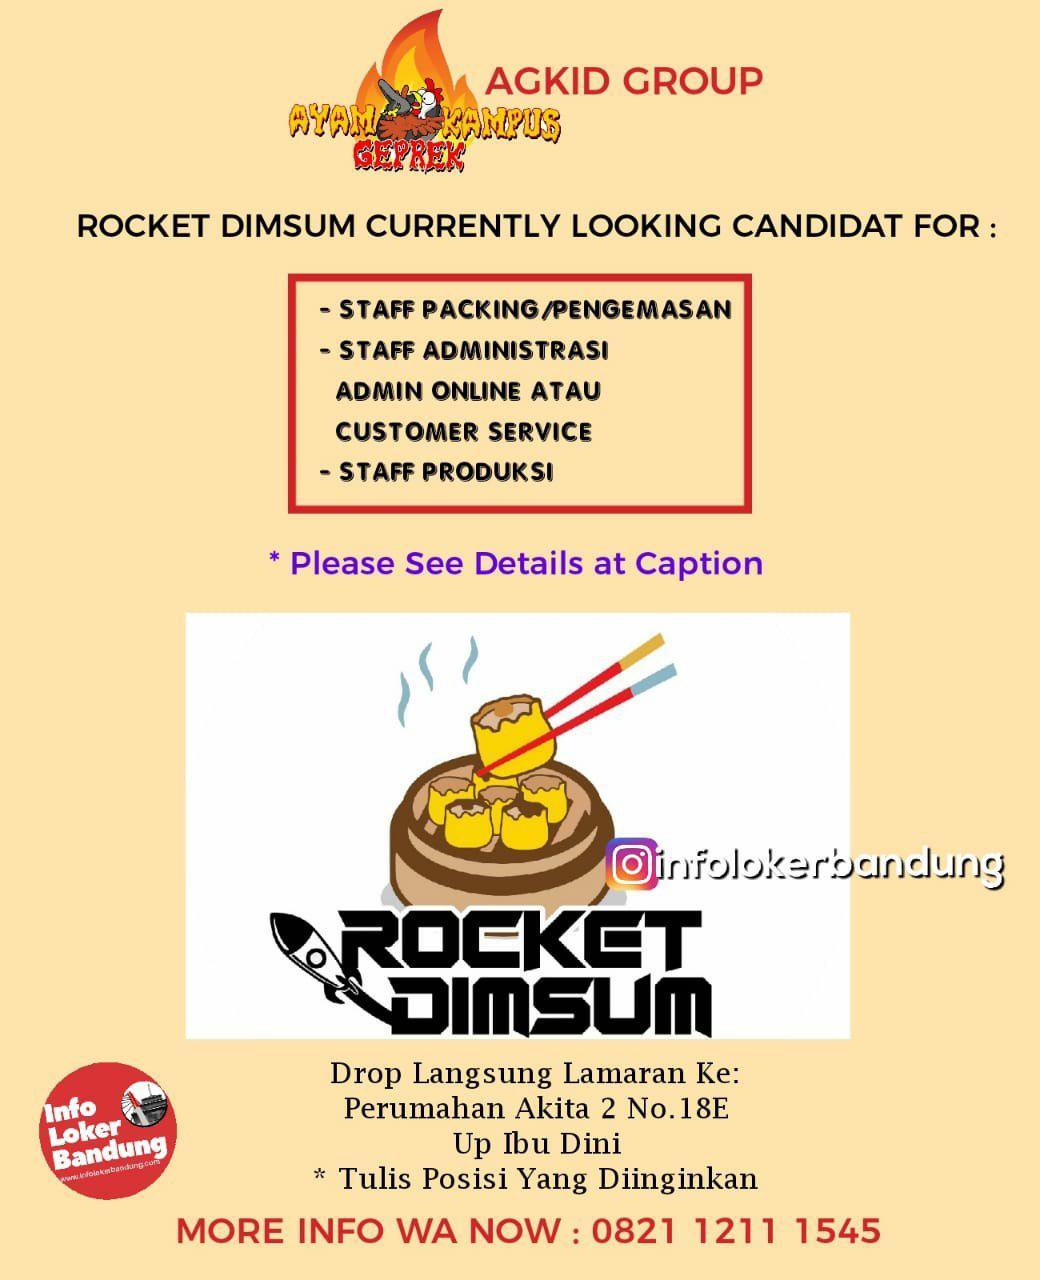 Lowongan Kerja Rocket Dimsum AGKID Group Bandung Februari 2019